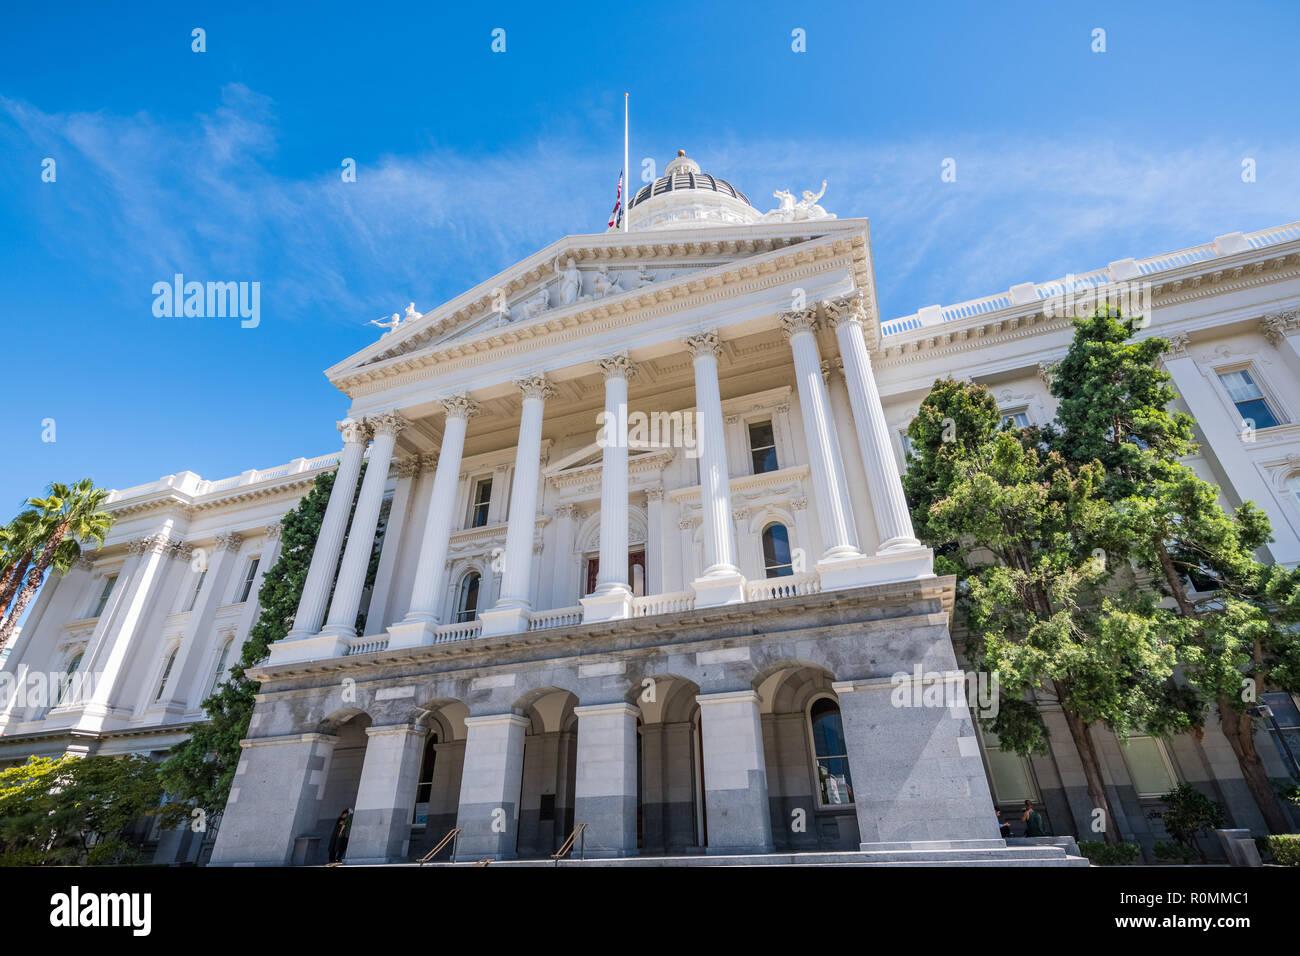 California State Capitol building, Sacramento, California Stock Photo